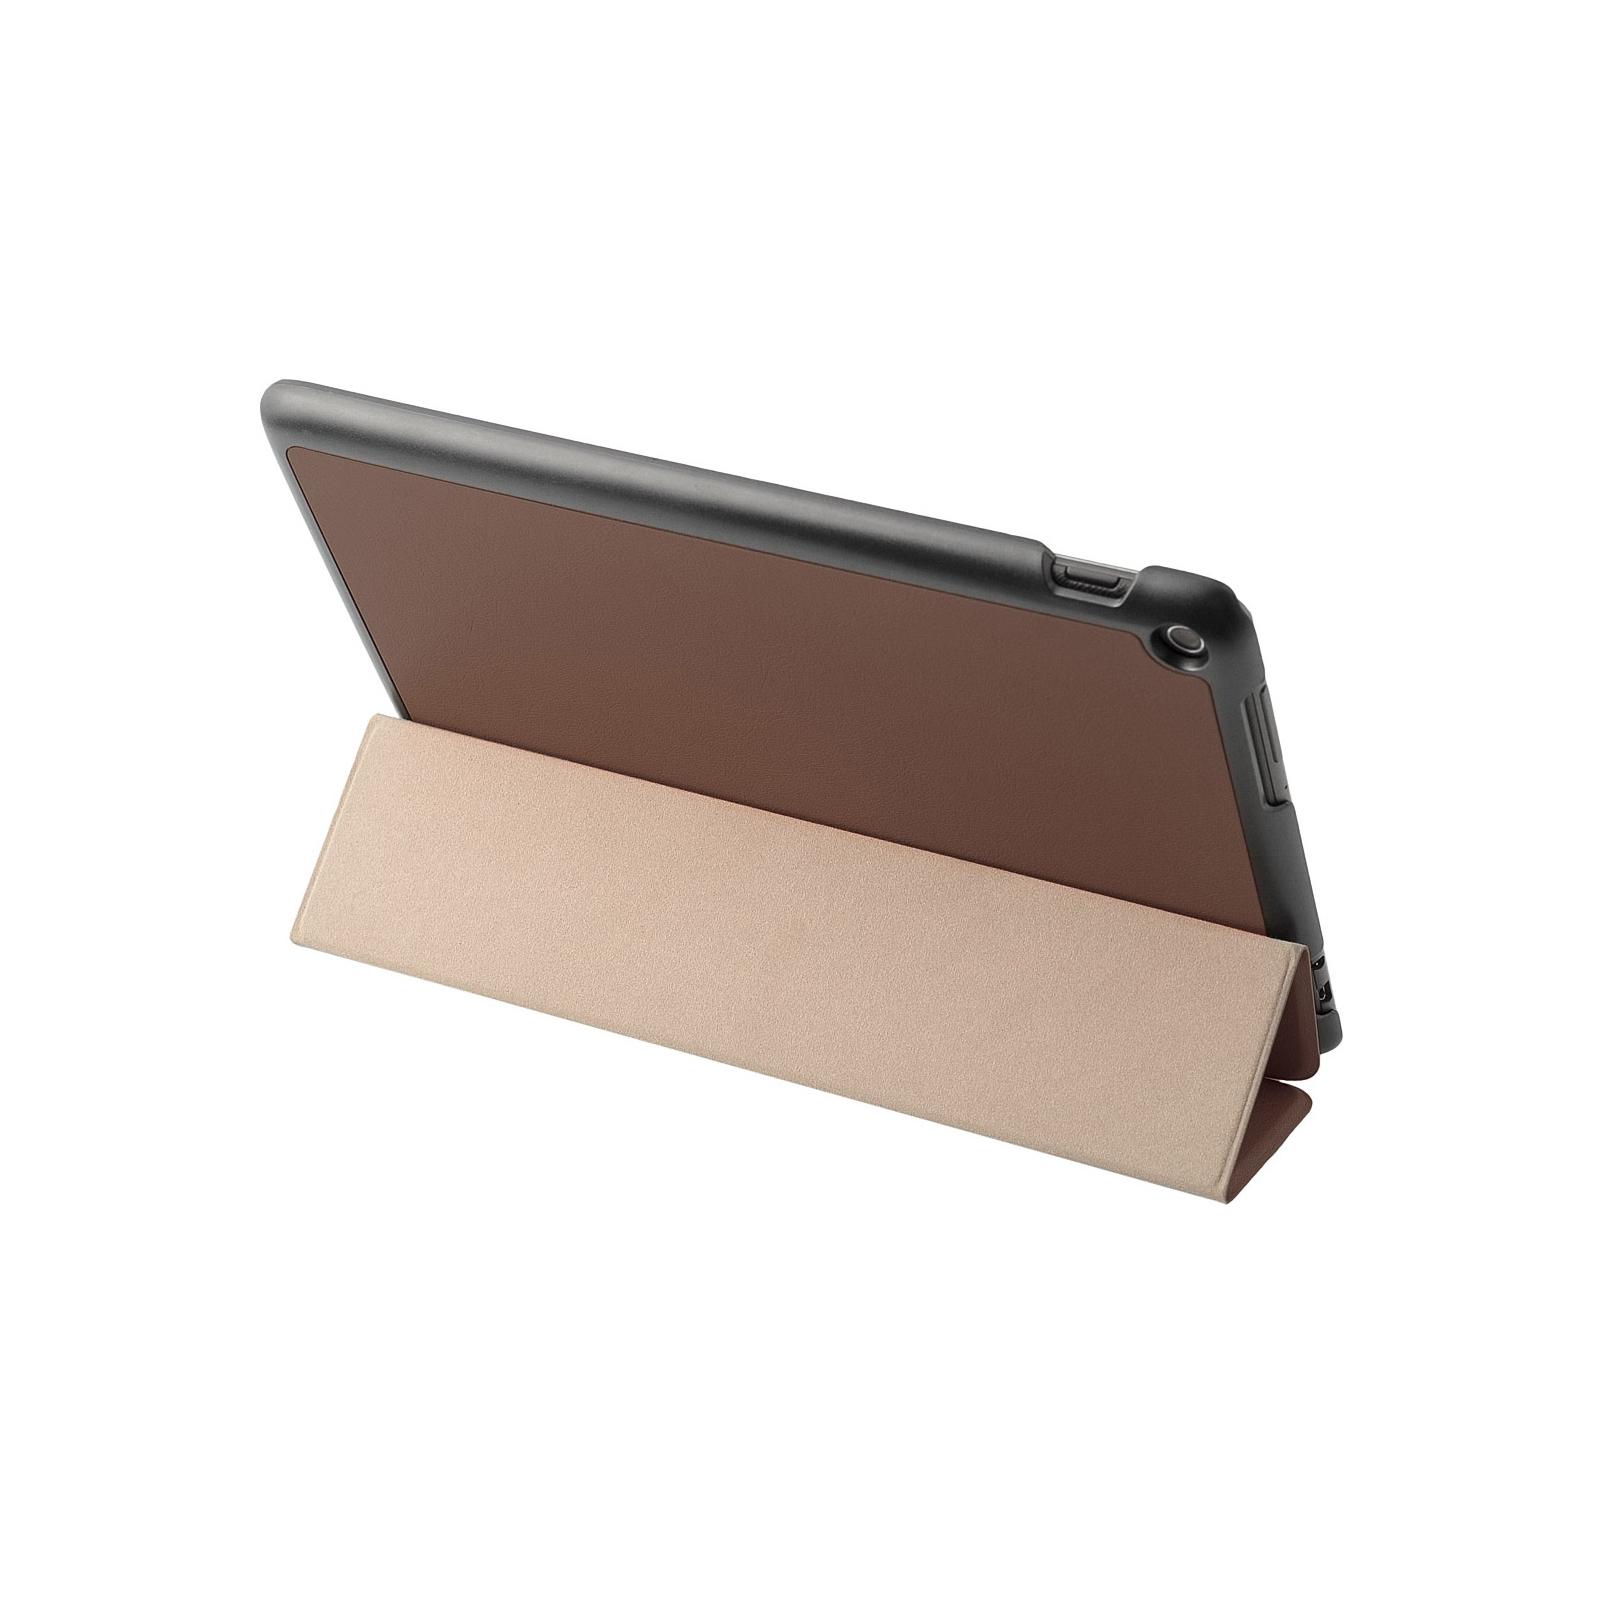 Чехол для планшета Grand-X ASUS ZenPad 10 Z300/Z300C Brown (ATC - AZPZ300BR) изображение 6